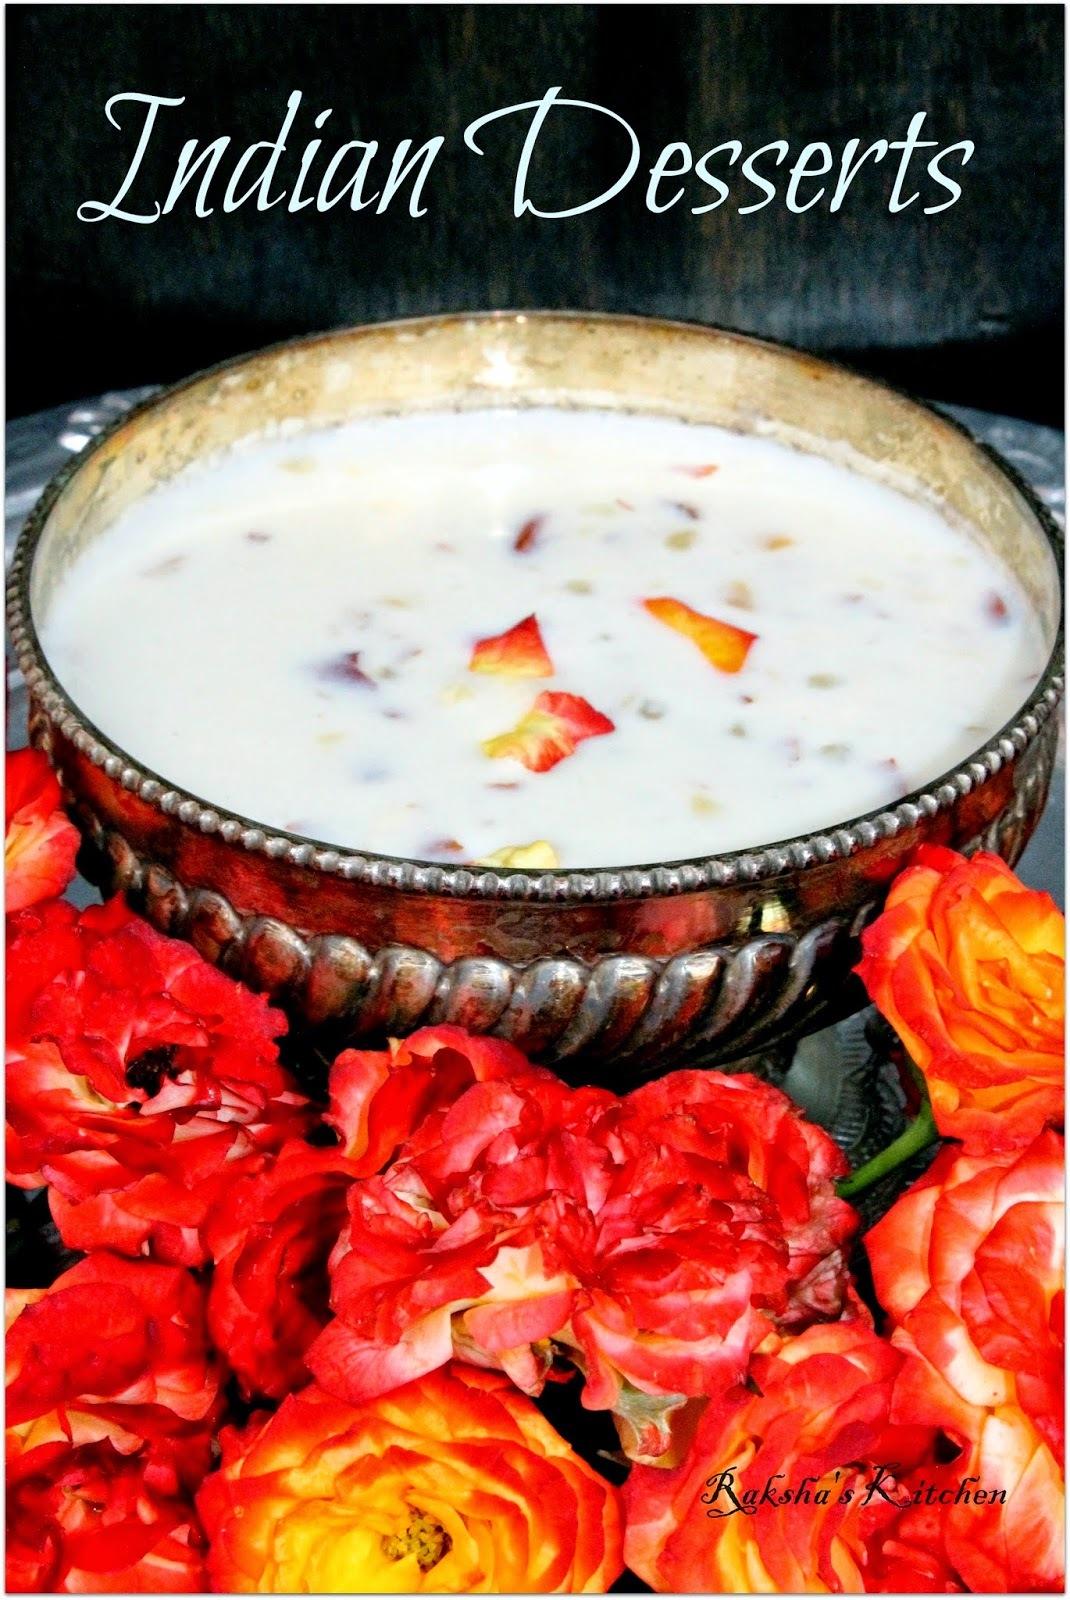 Contest Announcement - Indian Dessert Recipes, 2 People To Win Flipkart Vouchers